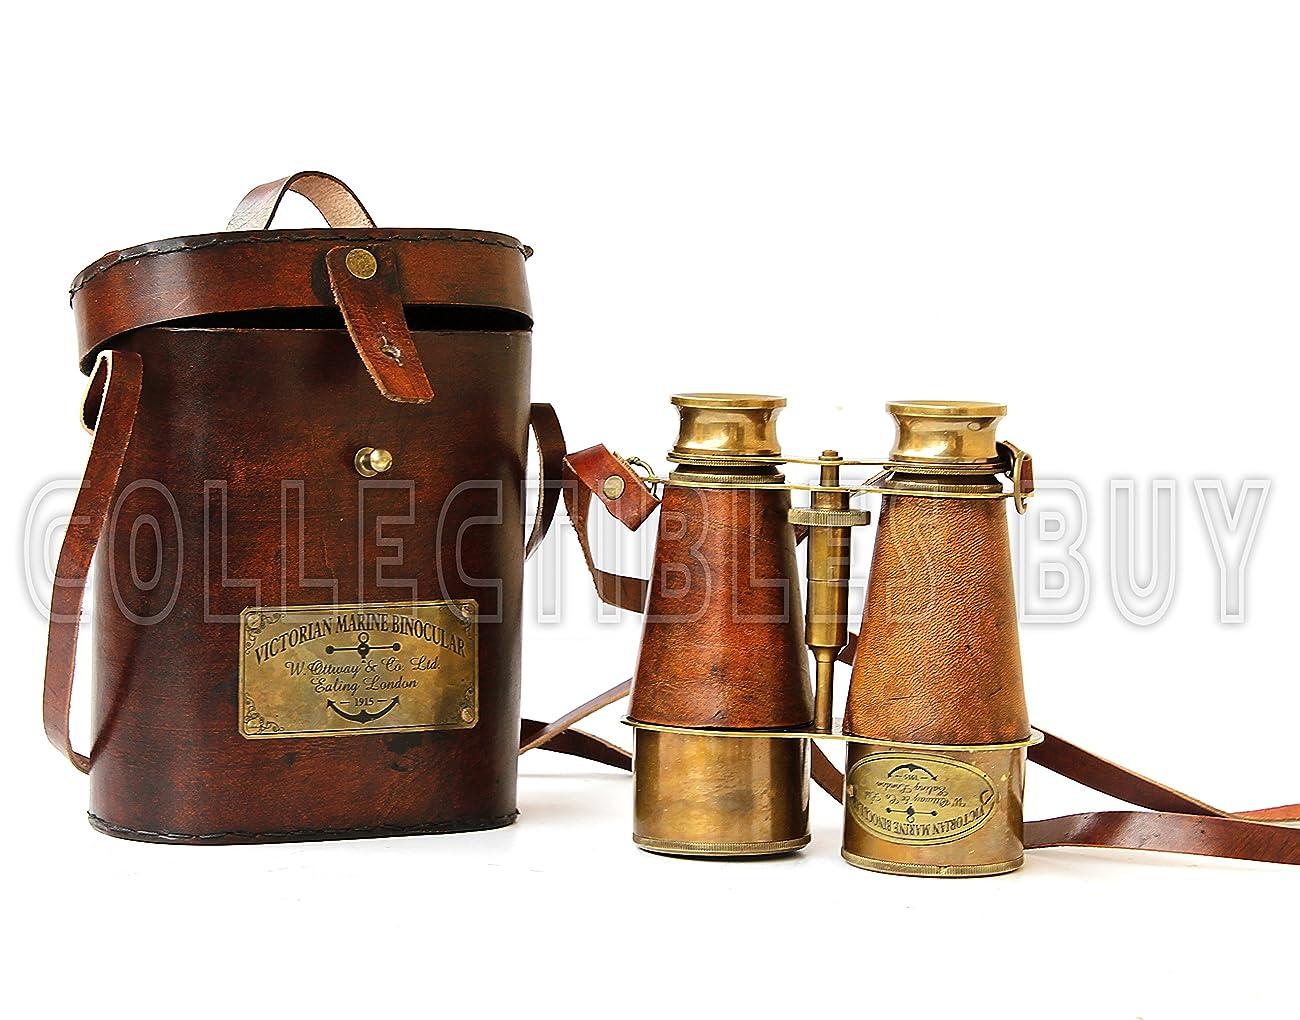 Victorian Marine Brass Leather Binocular Sailor Instrument London 1915 1